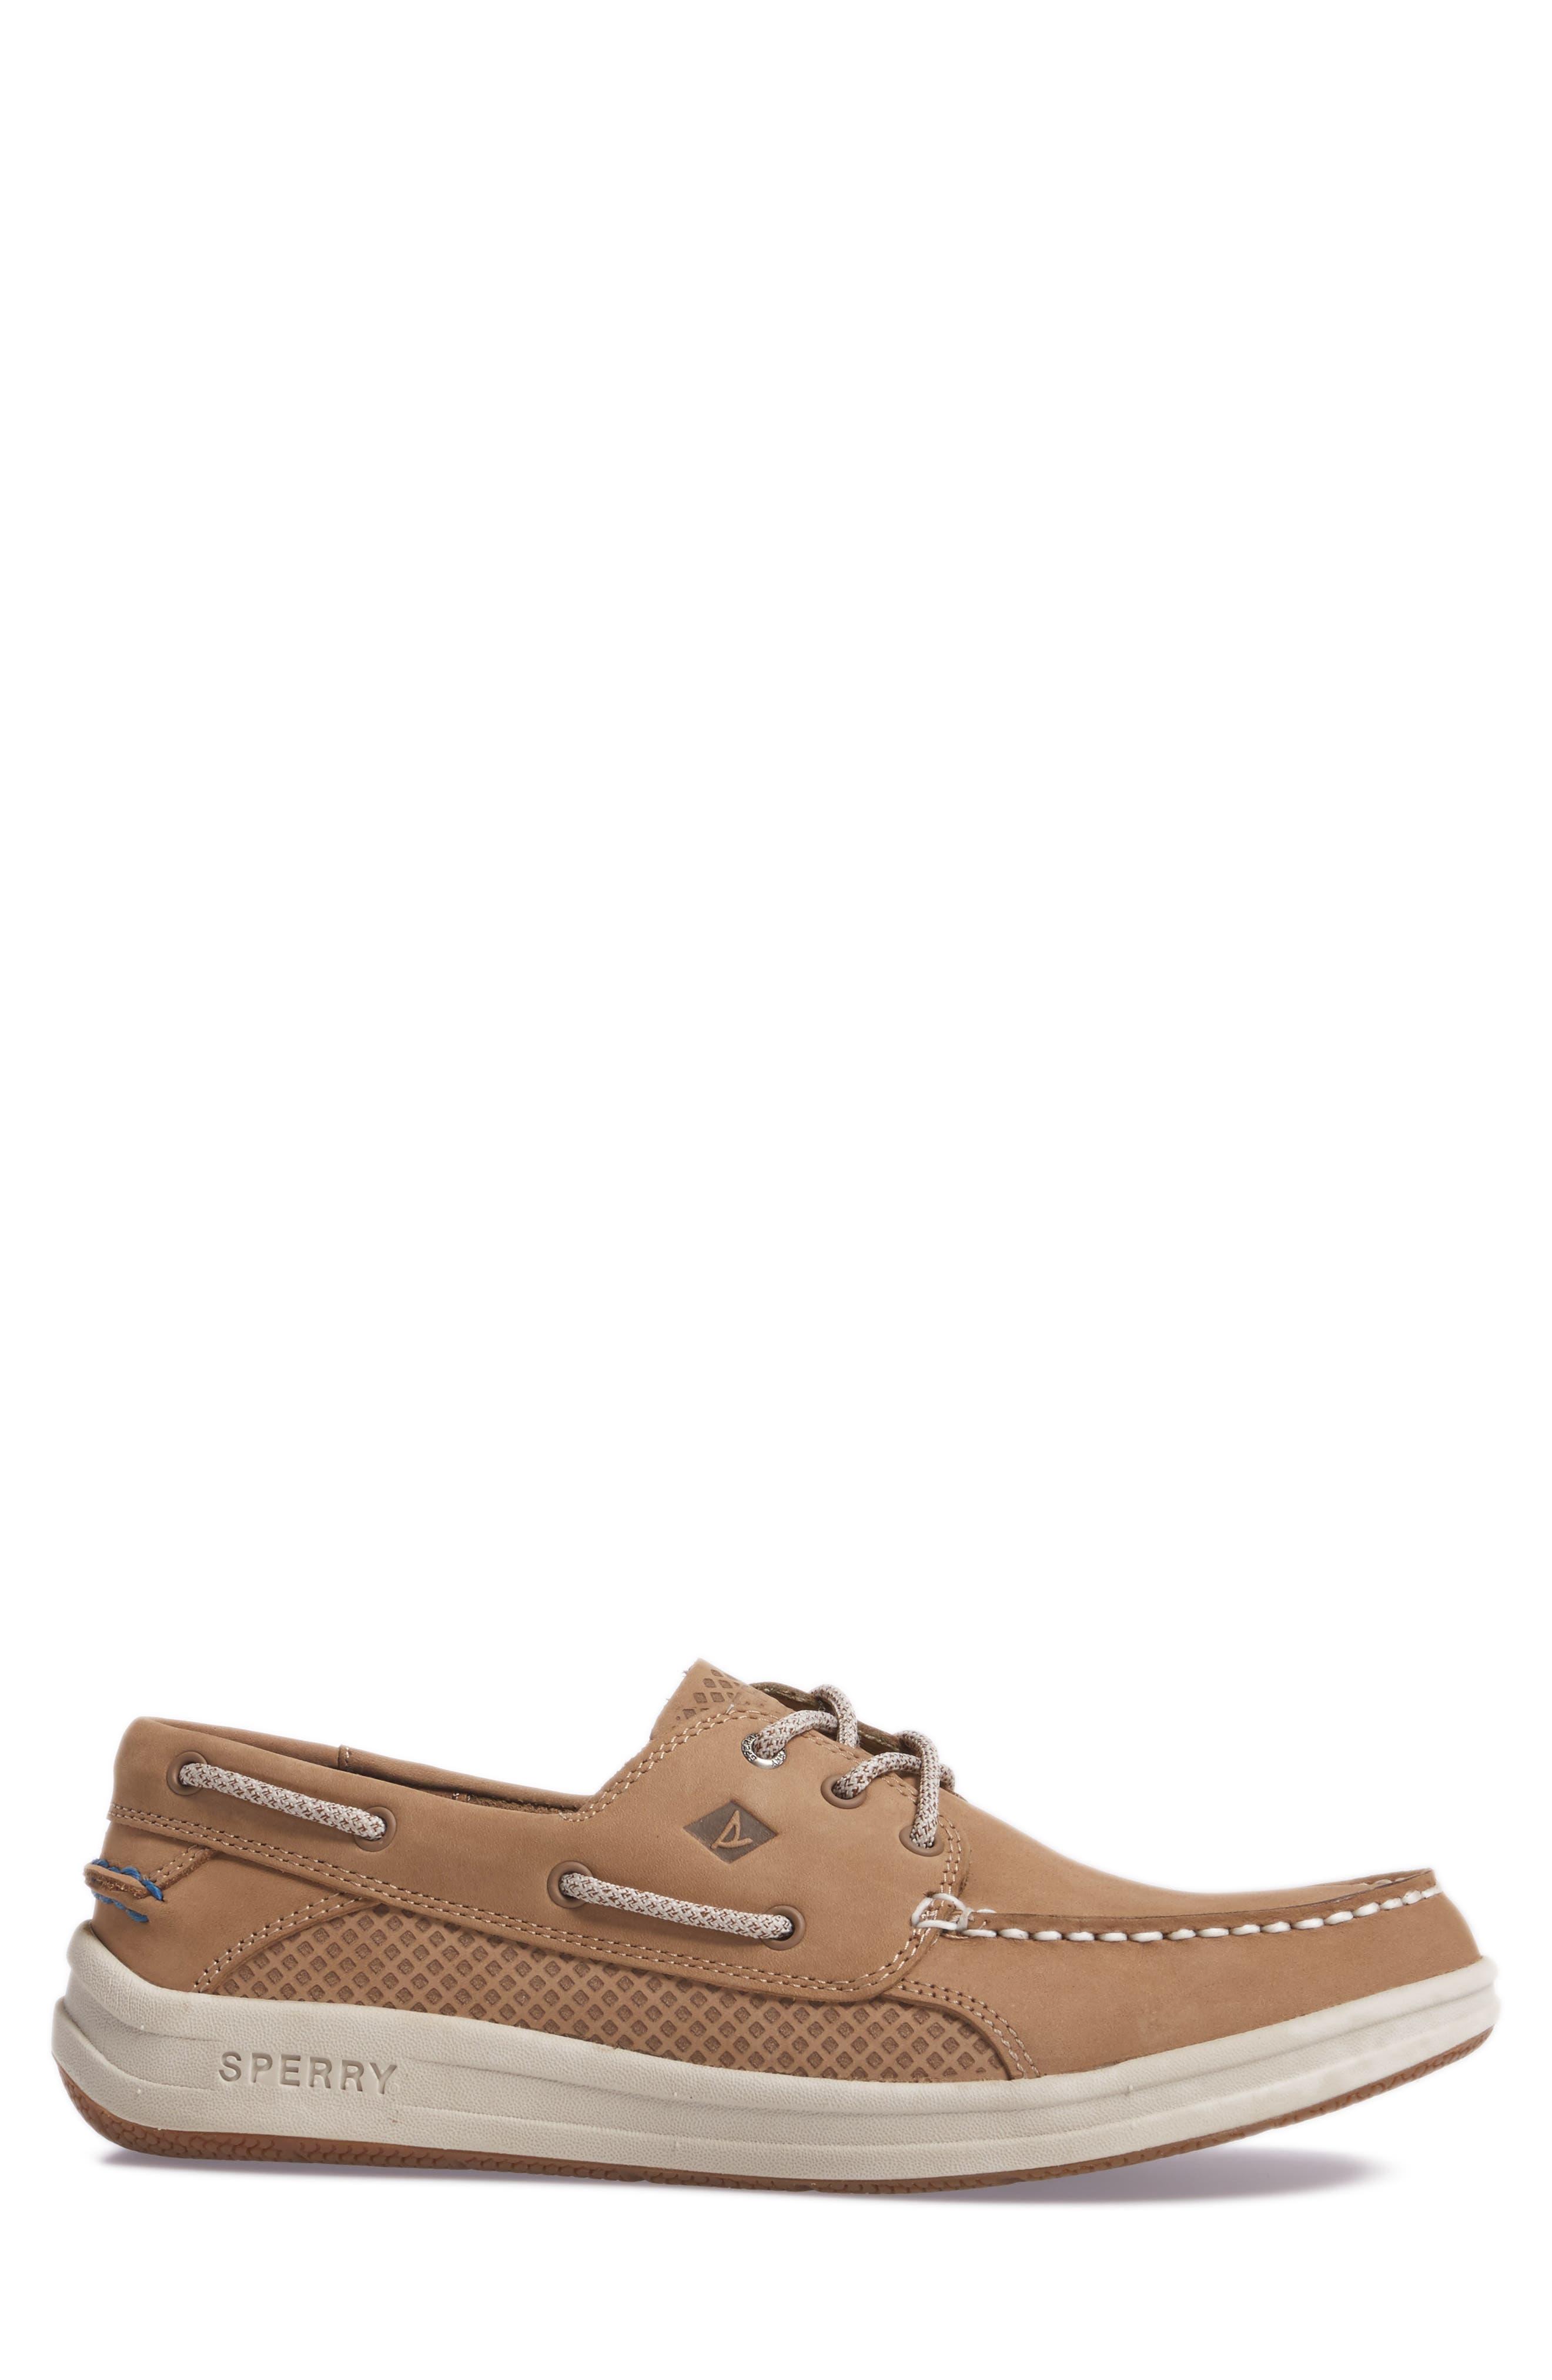 Gamefish Boat Shoe,                             Alternate thumbnail 3, color,                             Linen Leather